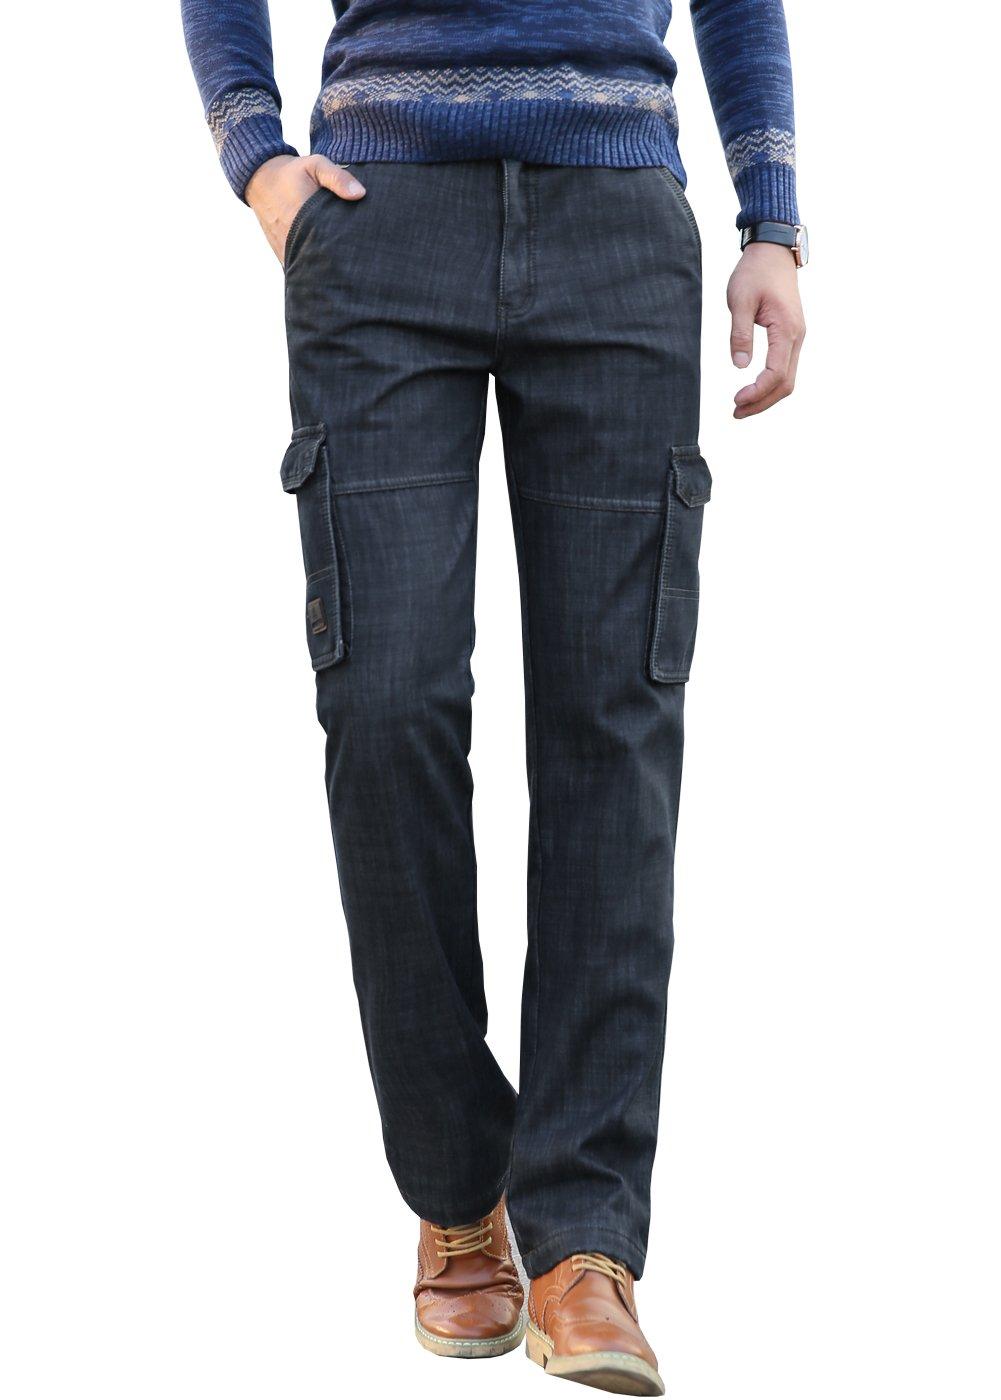 WLLLTO Men's Winter Fleece-Lined Thicken Warm Work Jeans Cargo Pants-33